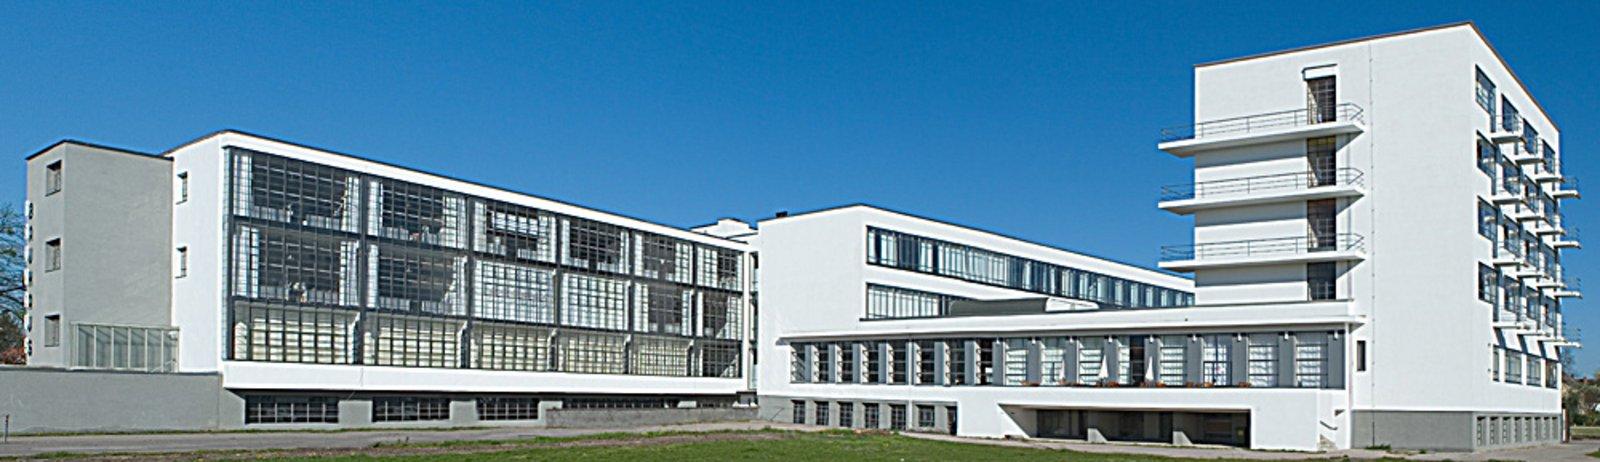 Transparency In Building Design